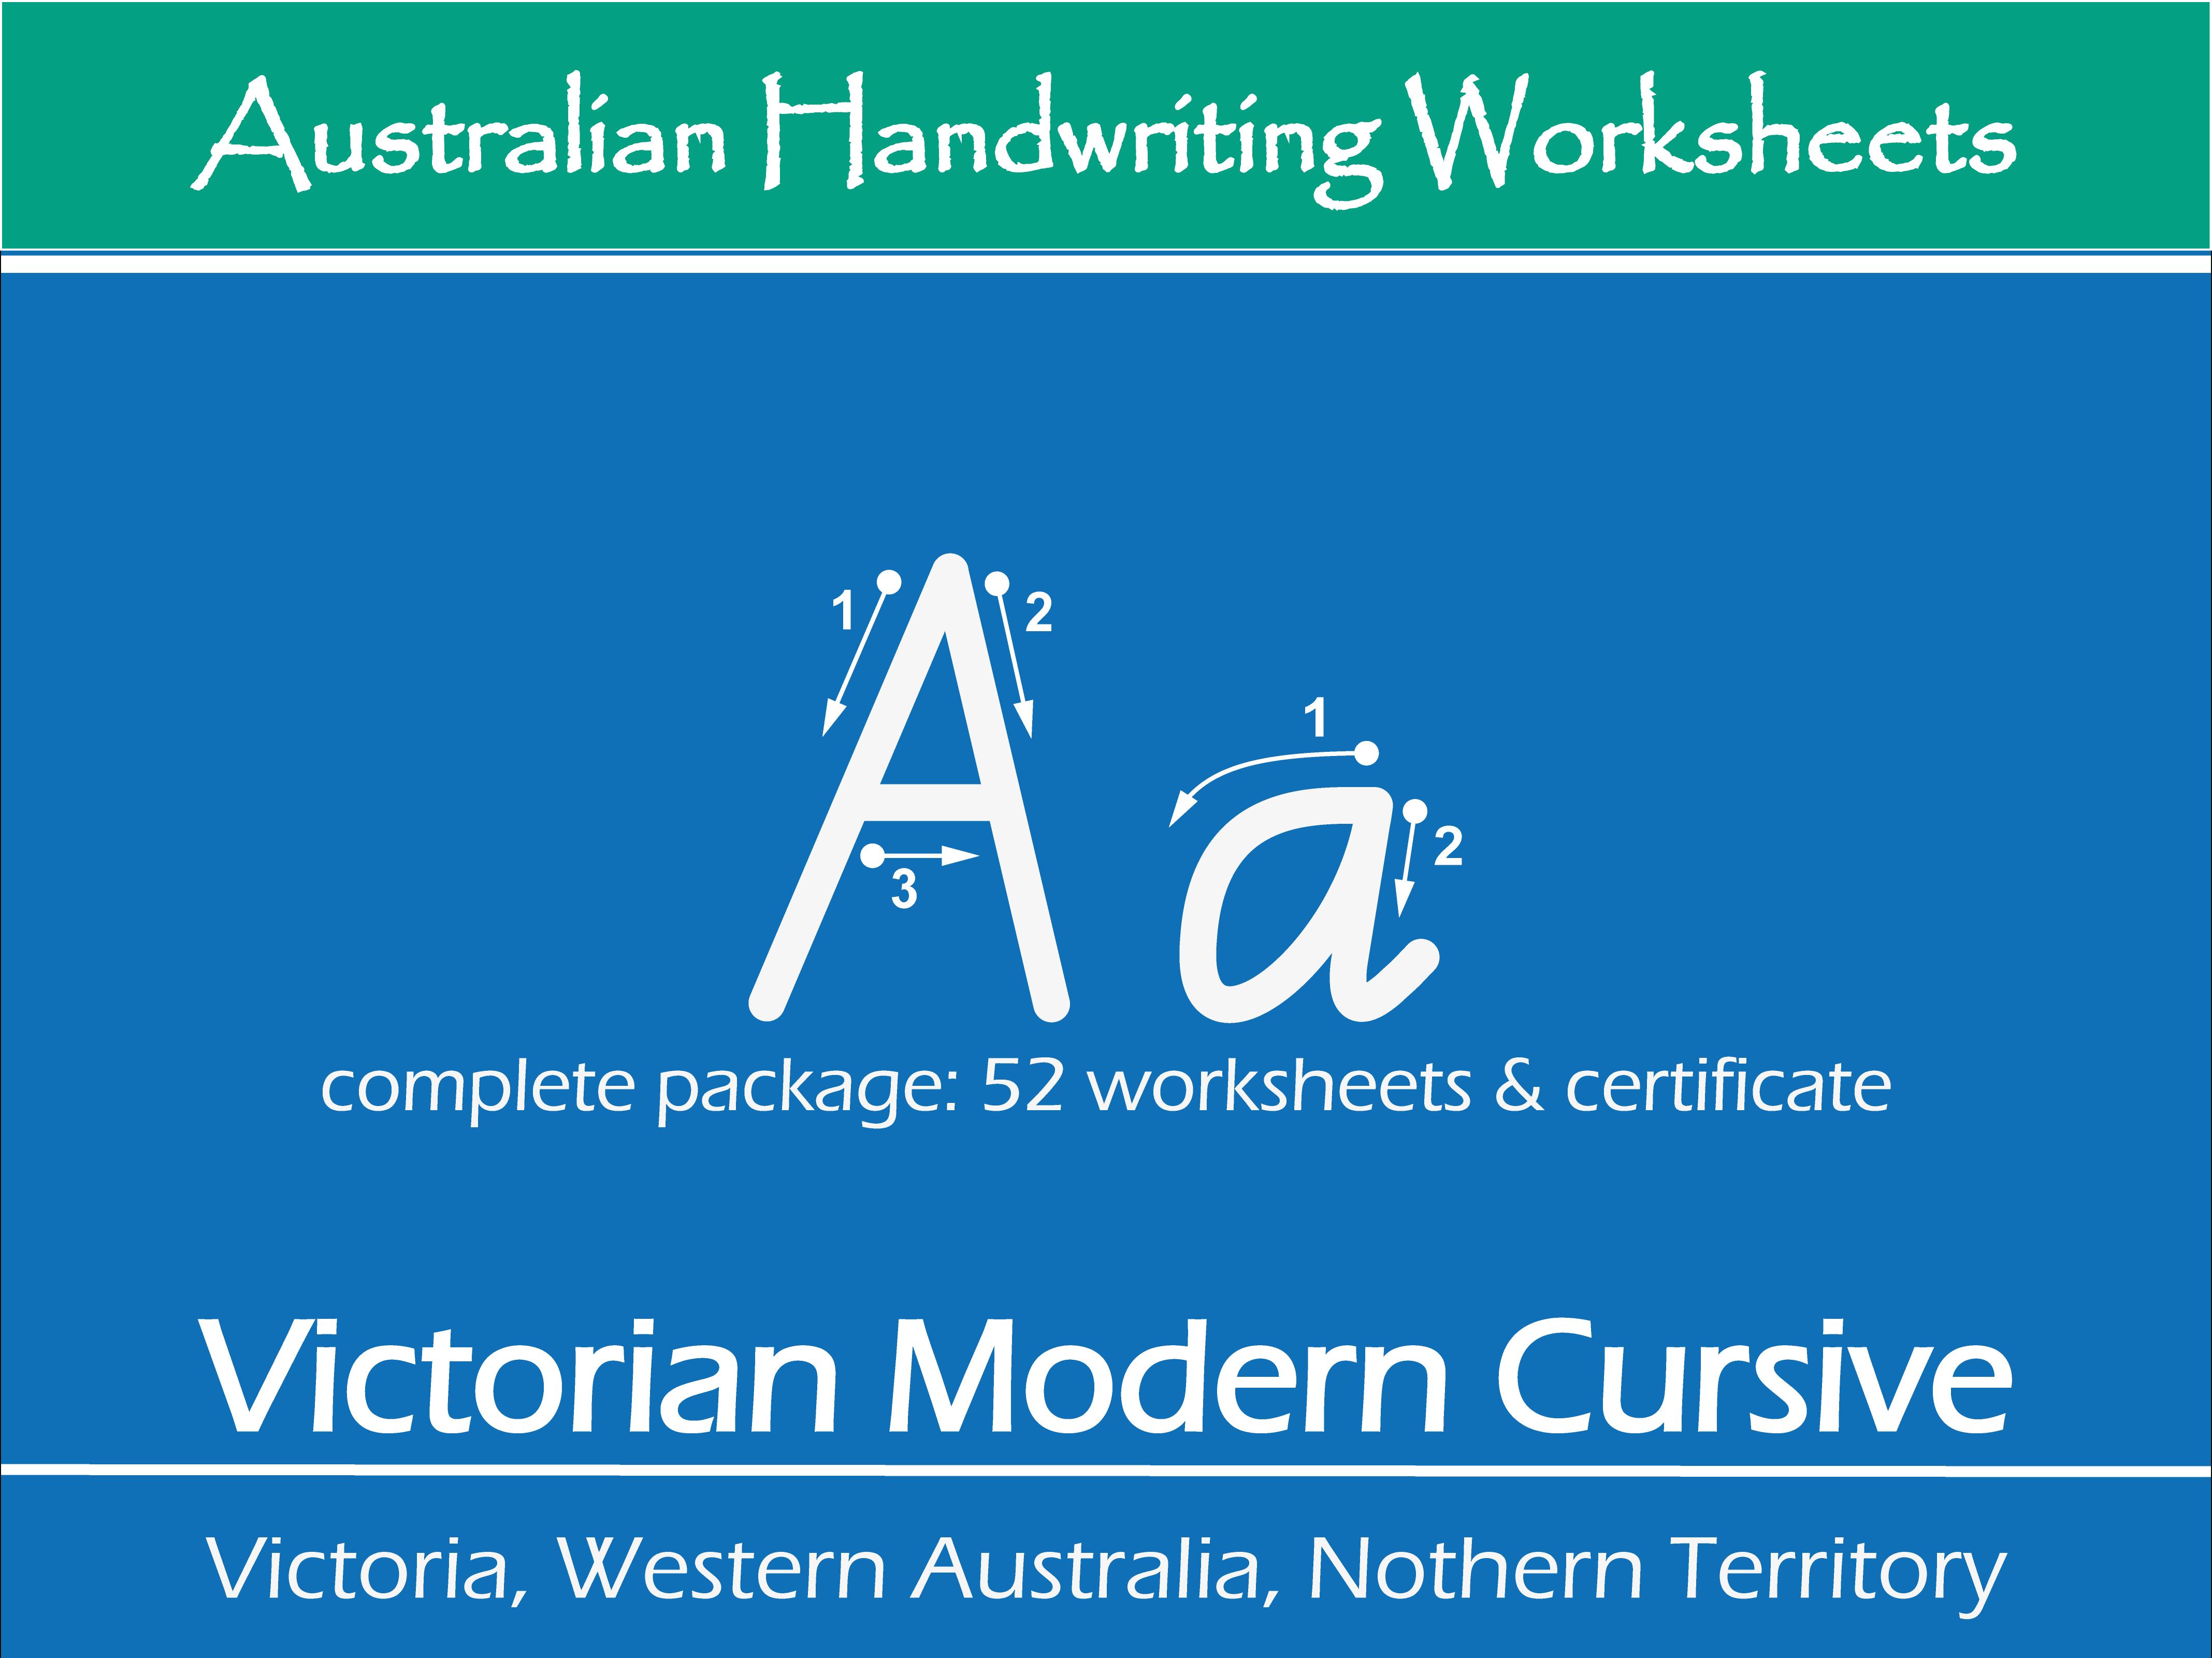 Victorian Modern Cursive Handwriting Worksheets - Complete Alphabet